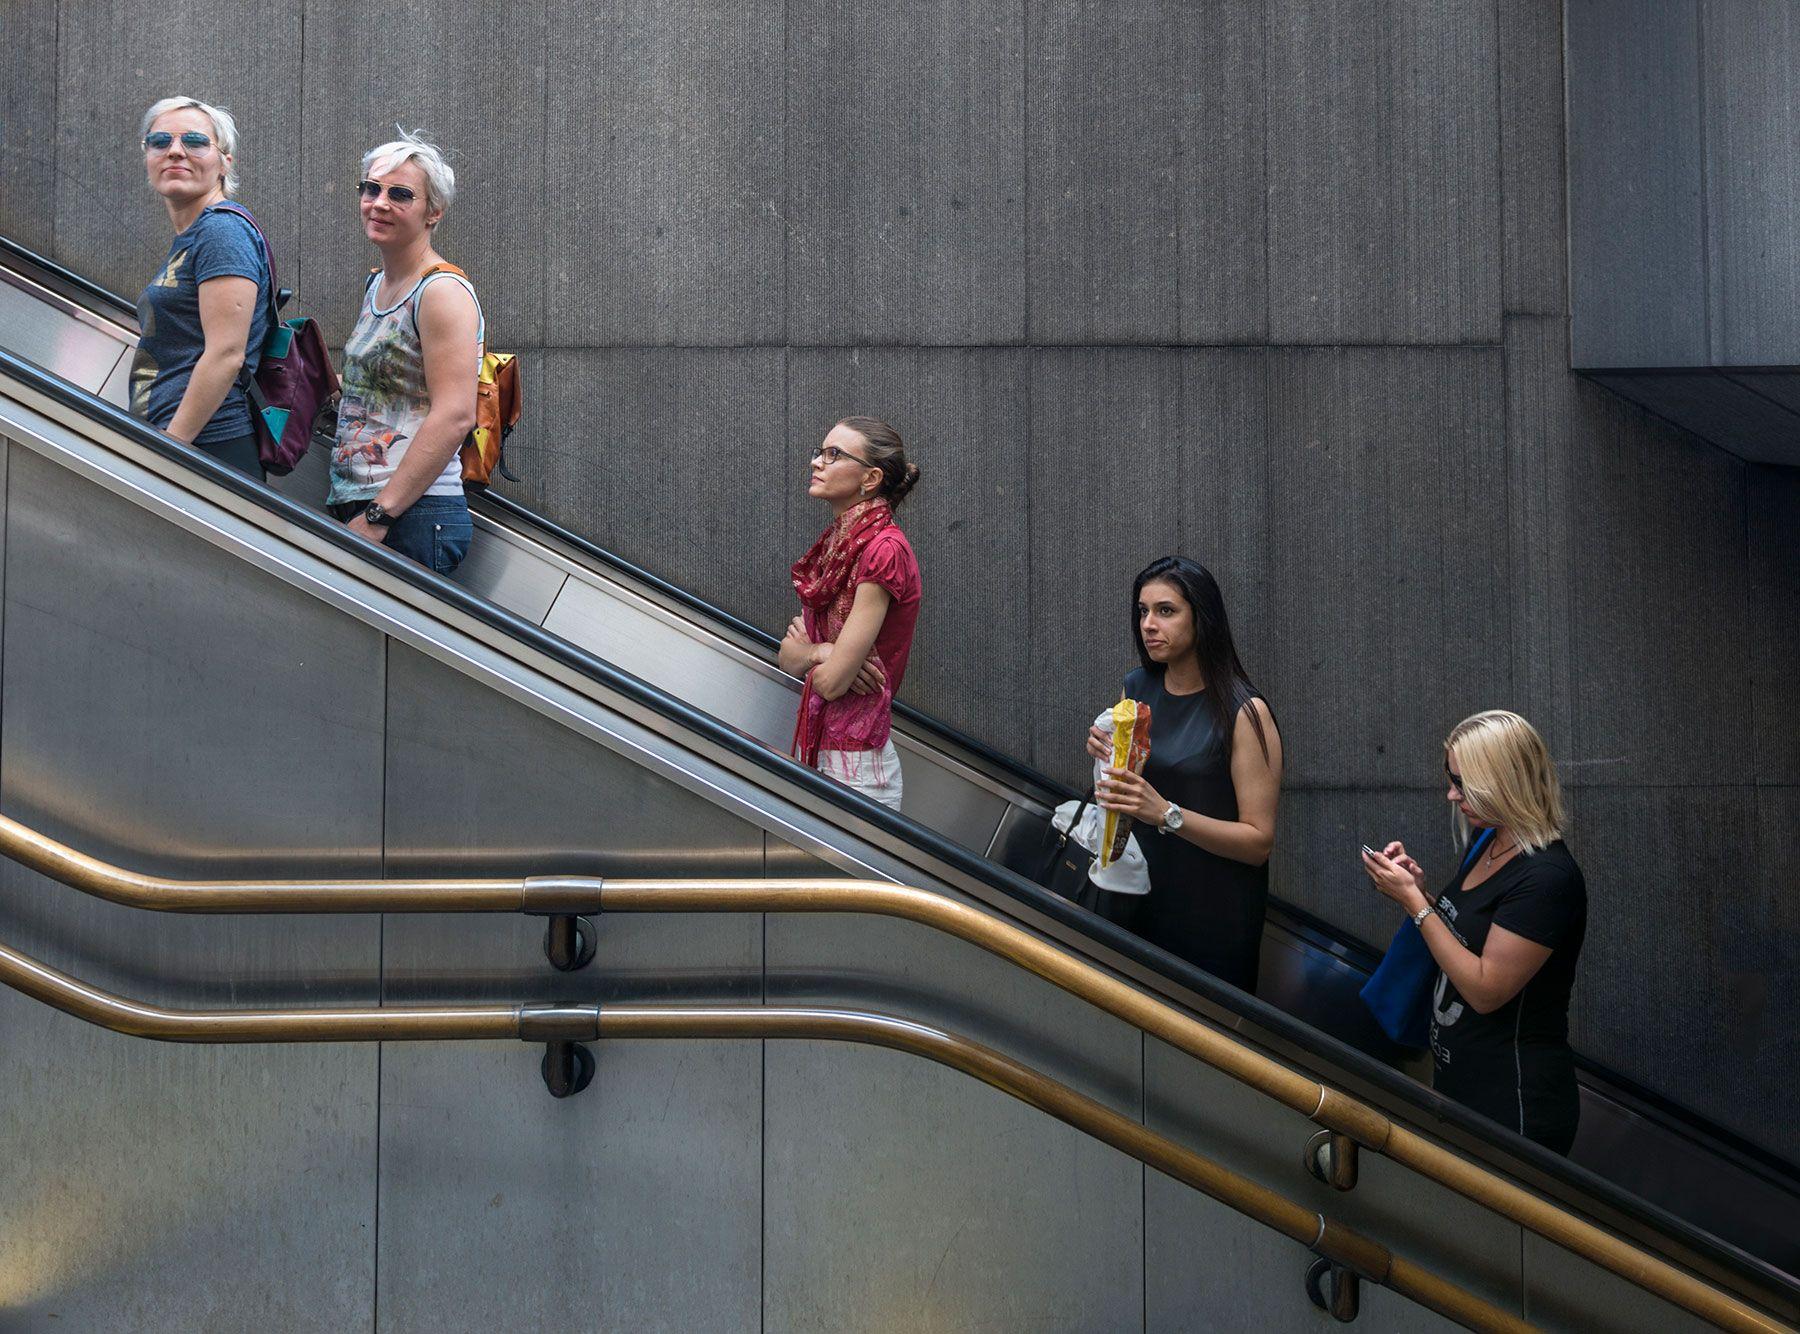 Una escalera mecánica